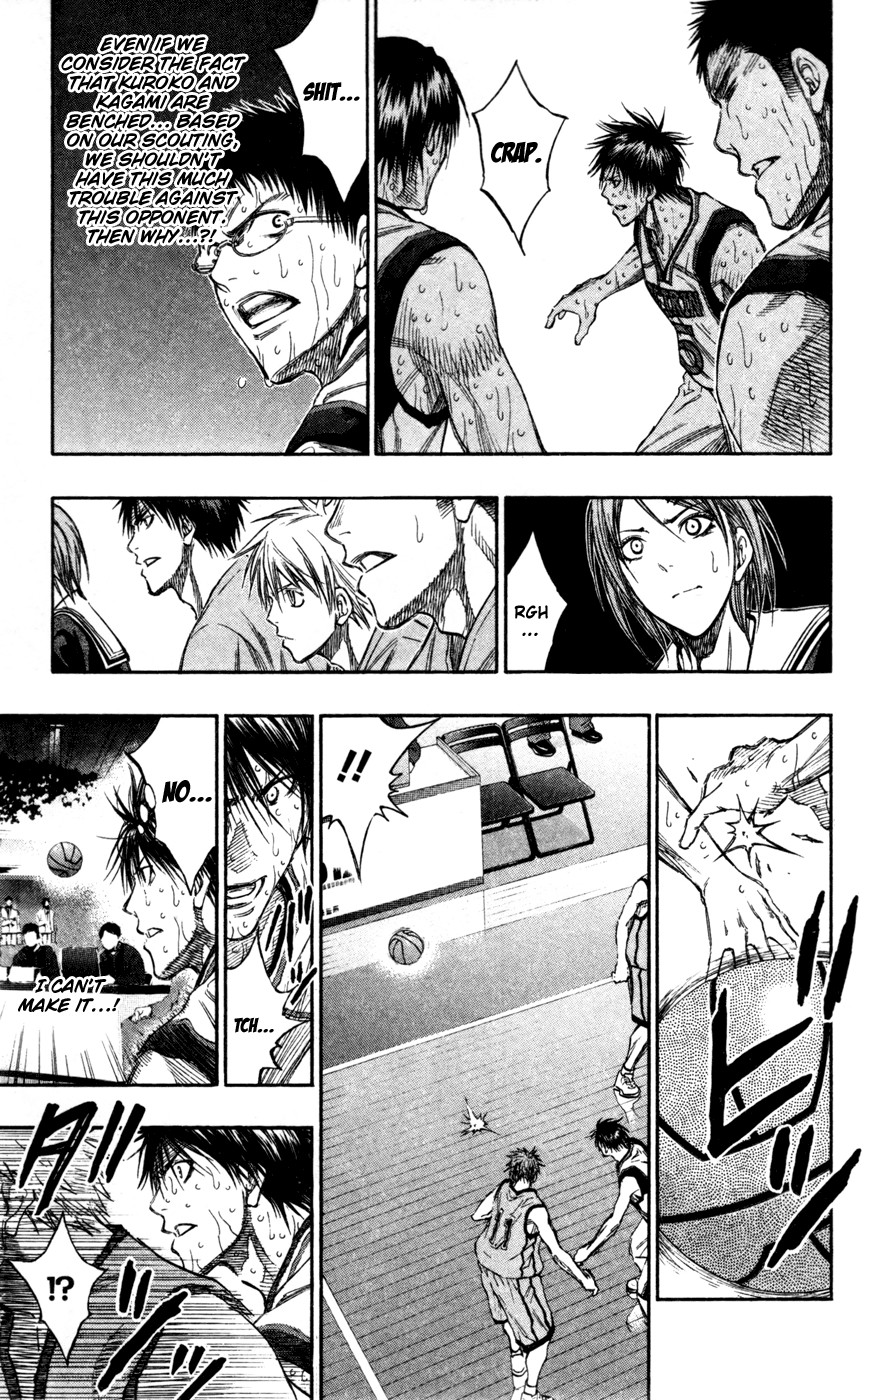 Kuroko no Basket Manga Chapter 143 - Image 05